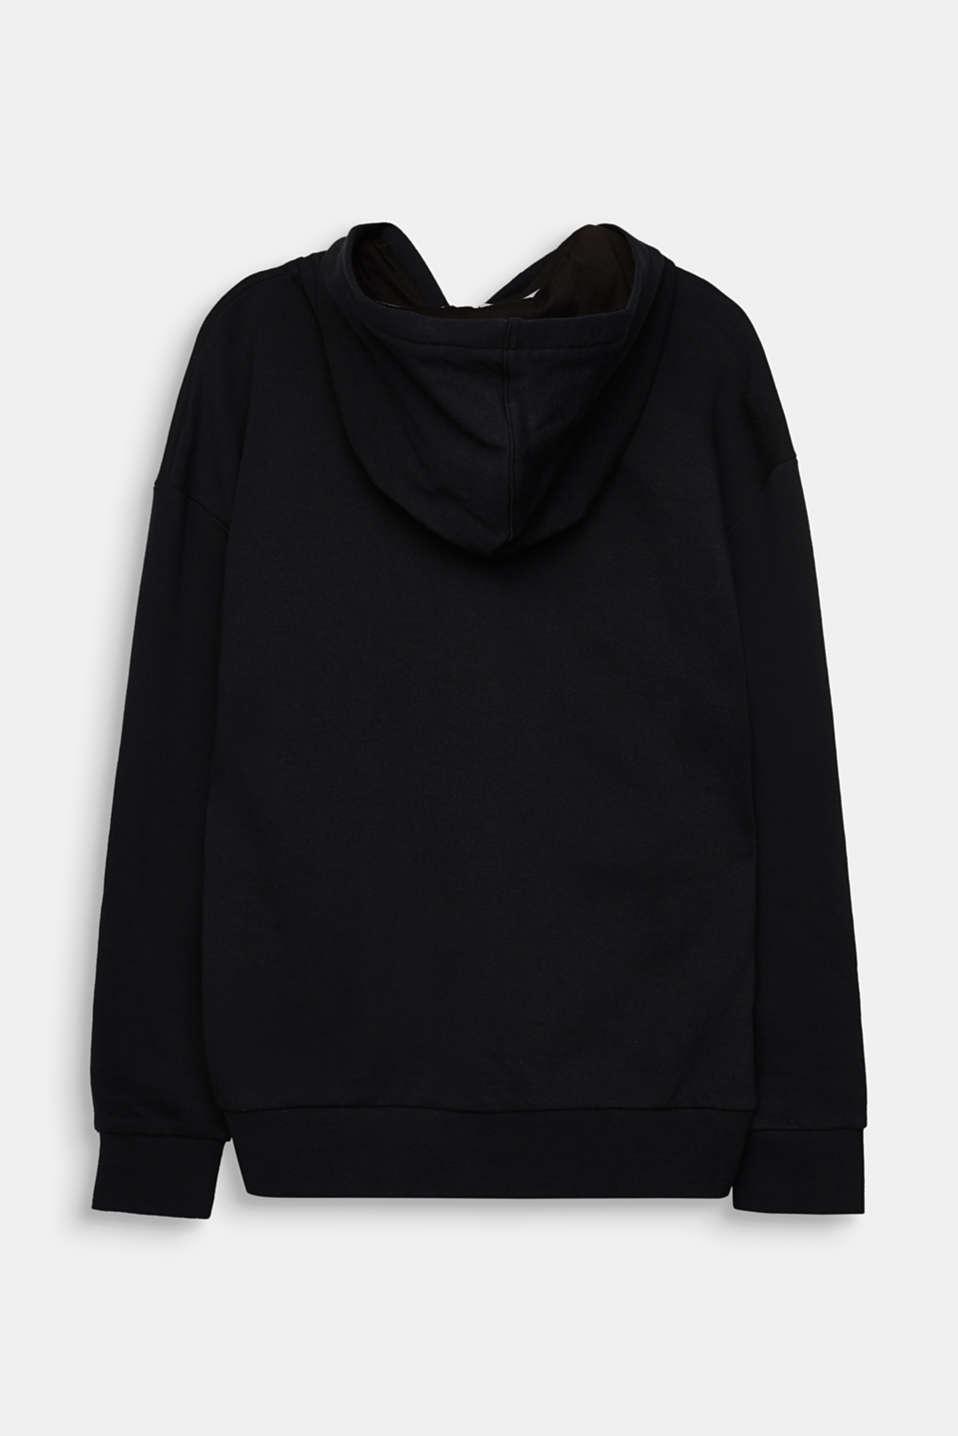 Sweatshirt cardigan with print, LCBLACK, detail image number 1